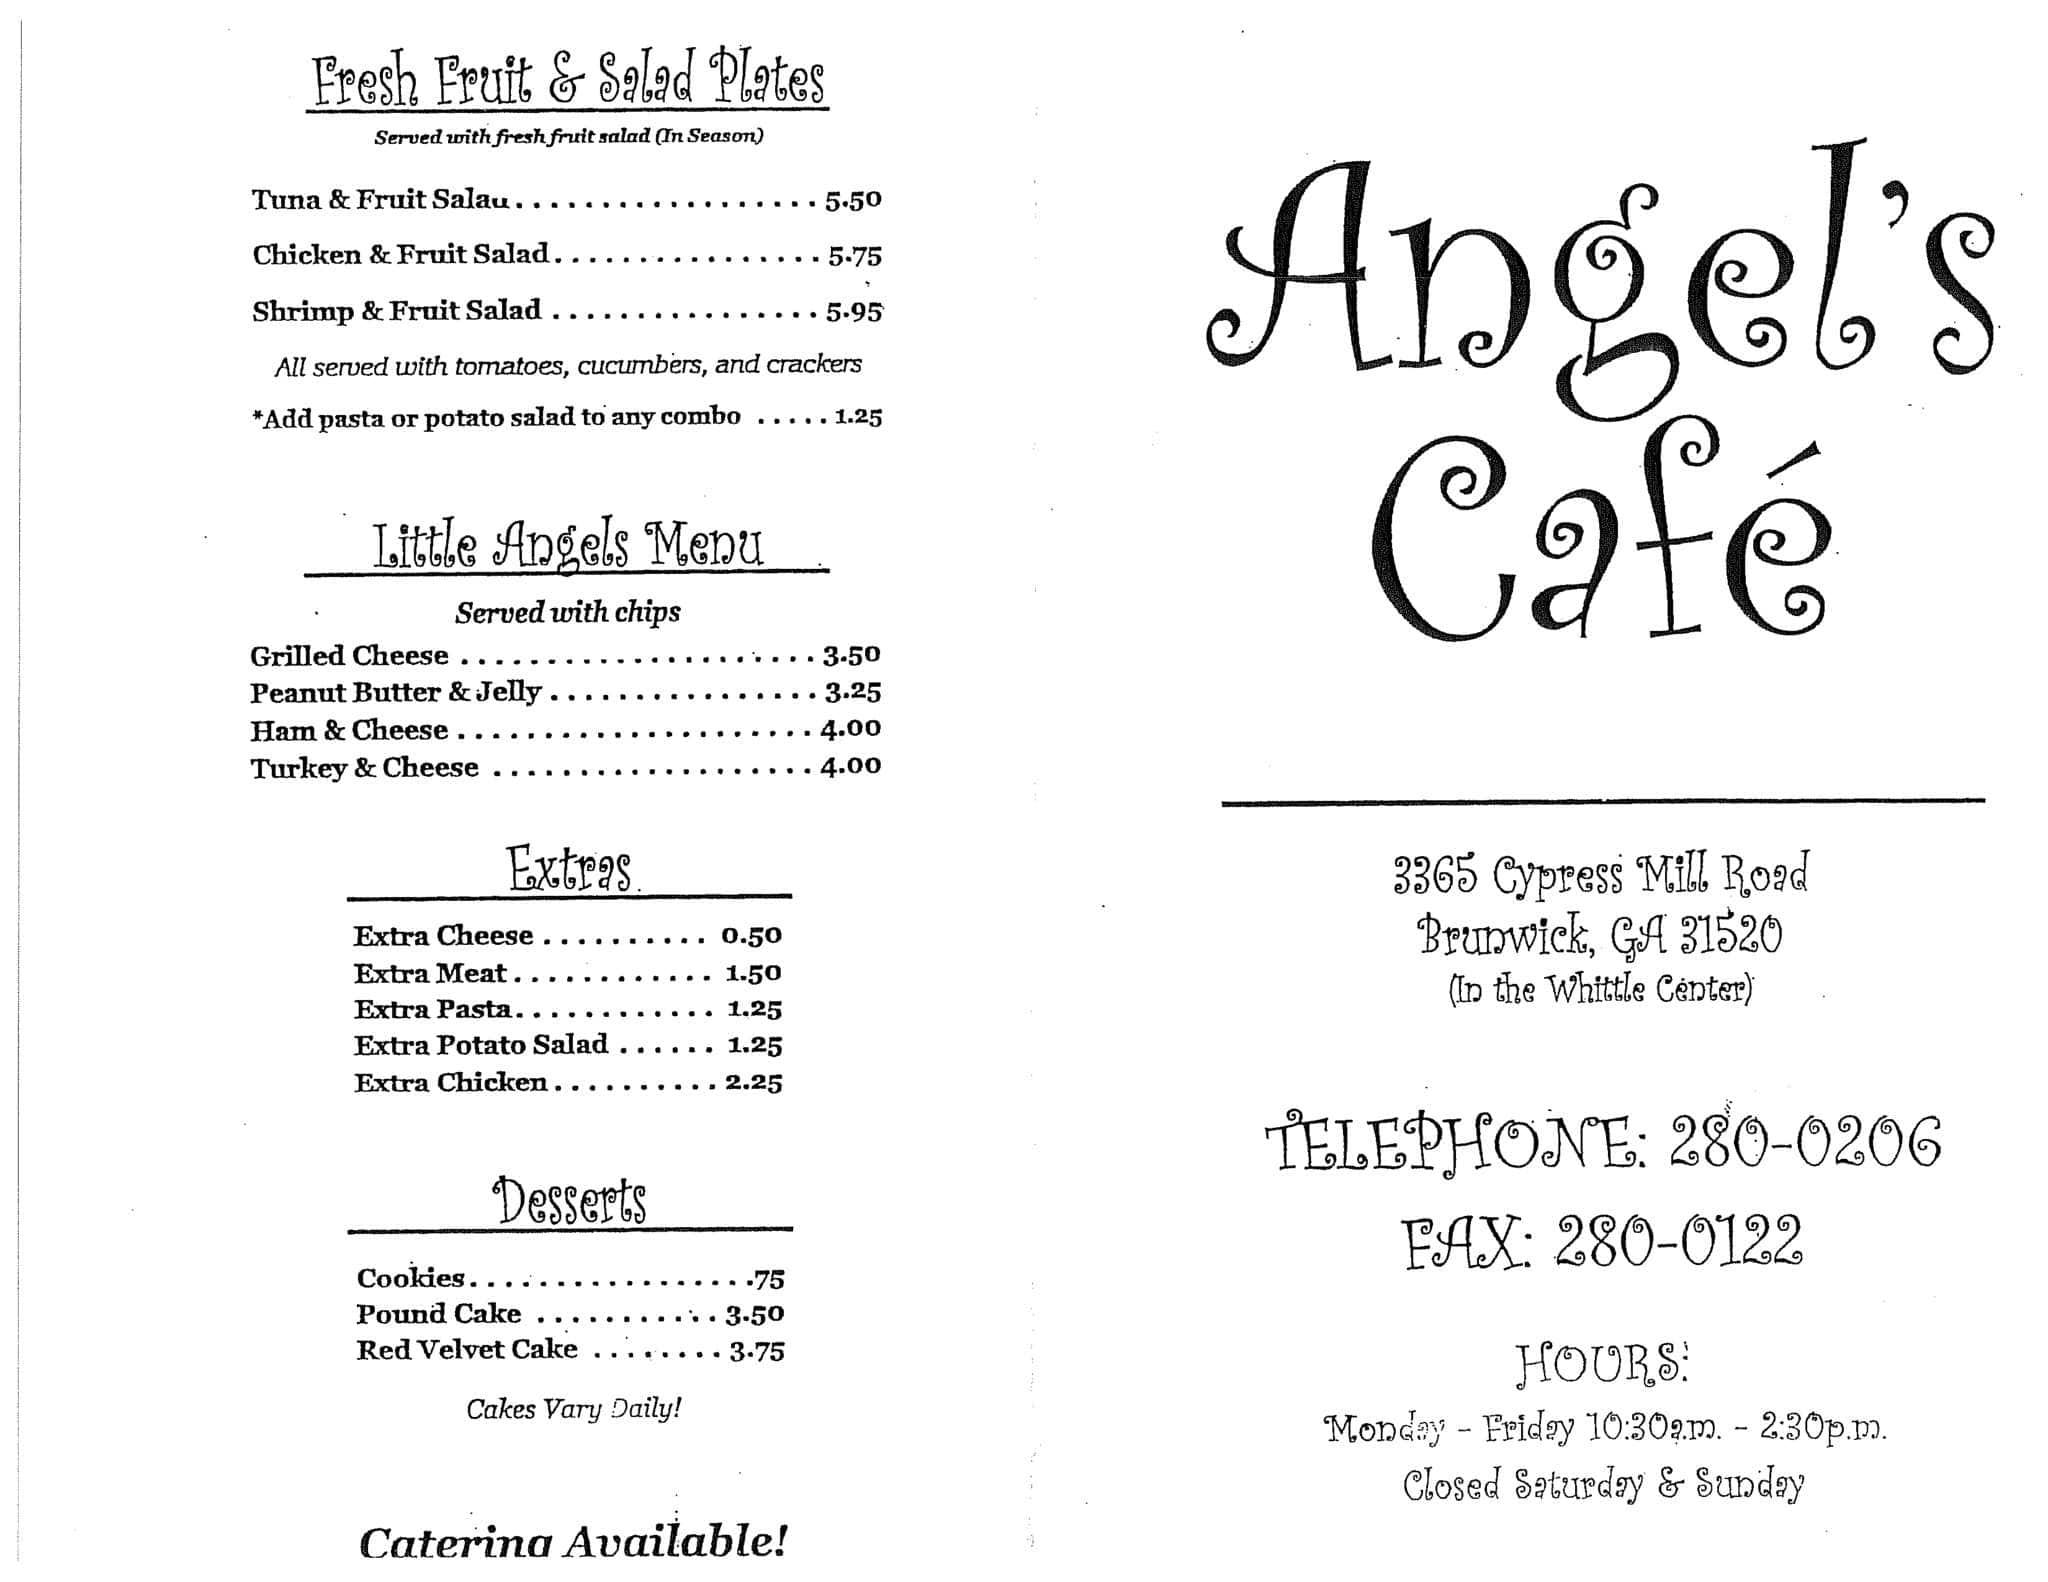 Angels Cafe Menu Brunswick Ga